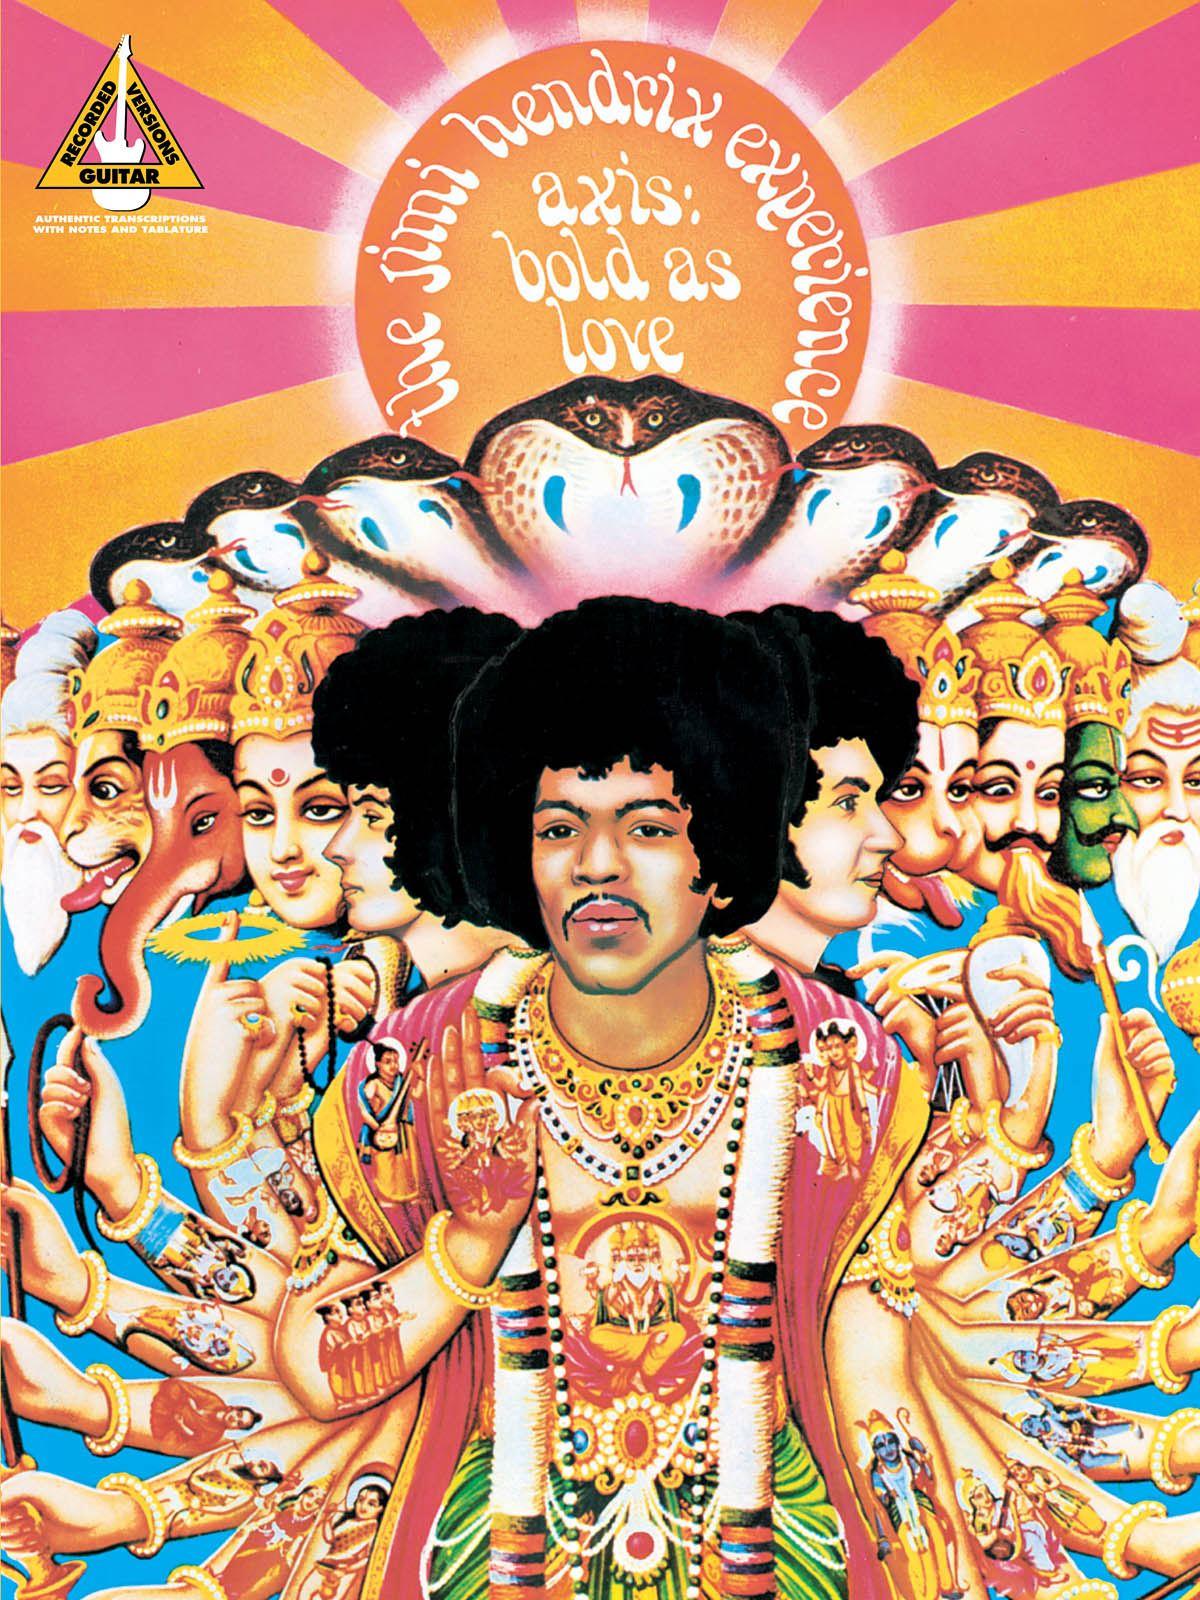 Jimi Hendrix: Jimi Hendrix - Axis: Bold As Love: Guitar Solo: Album Songbook